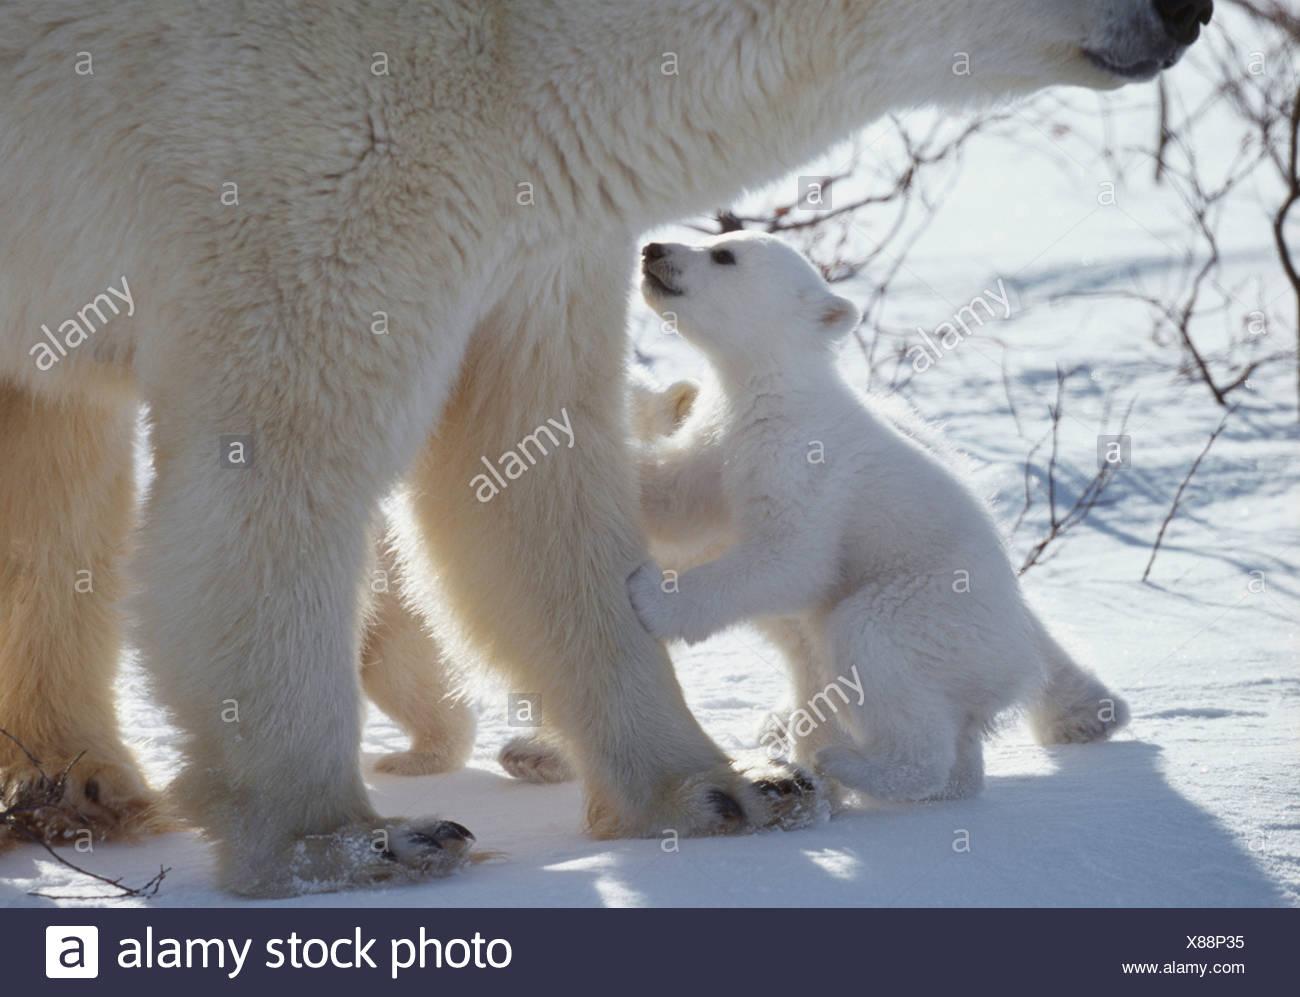 Polar bear cub begs from mother, Manitoba, Canada - Stock Image